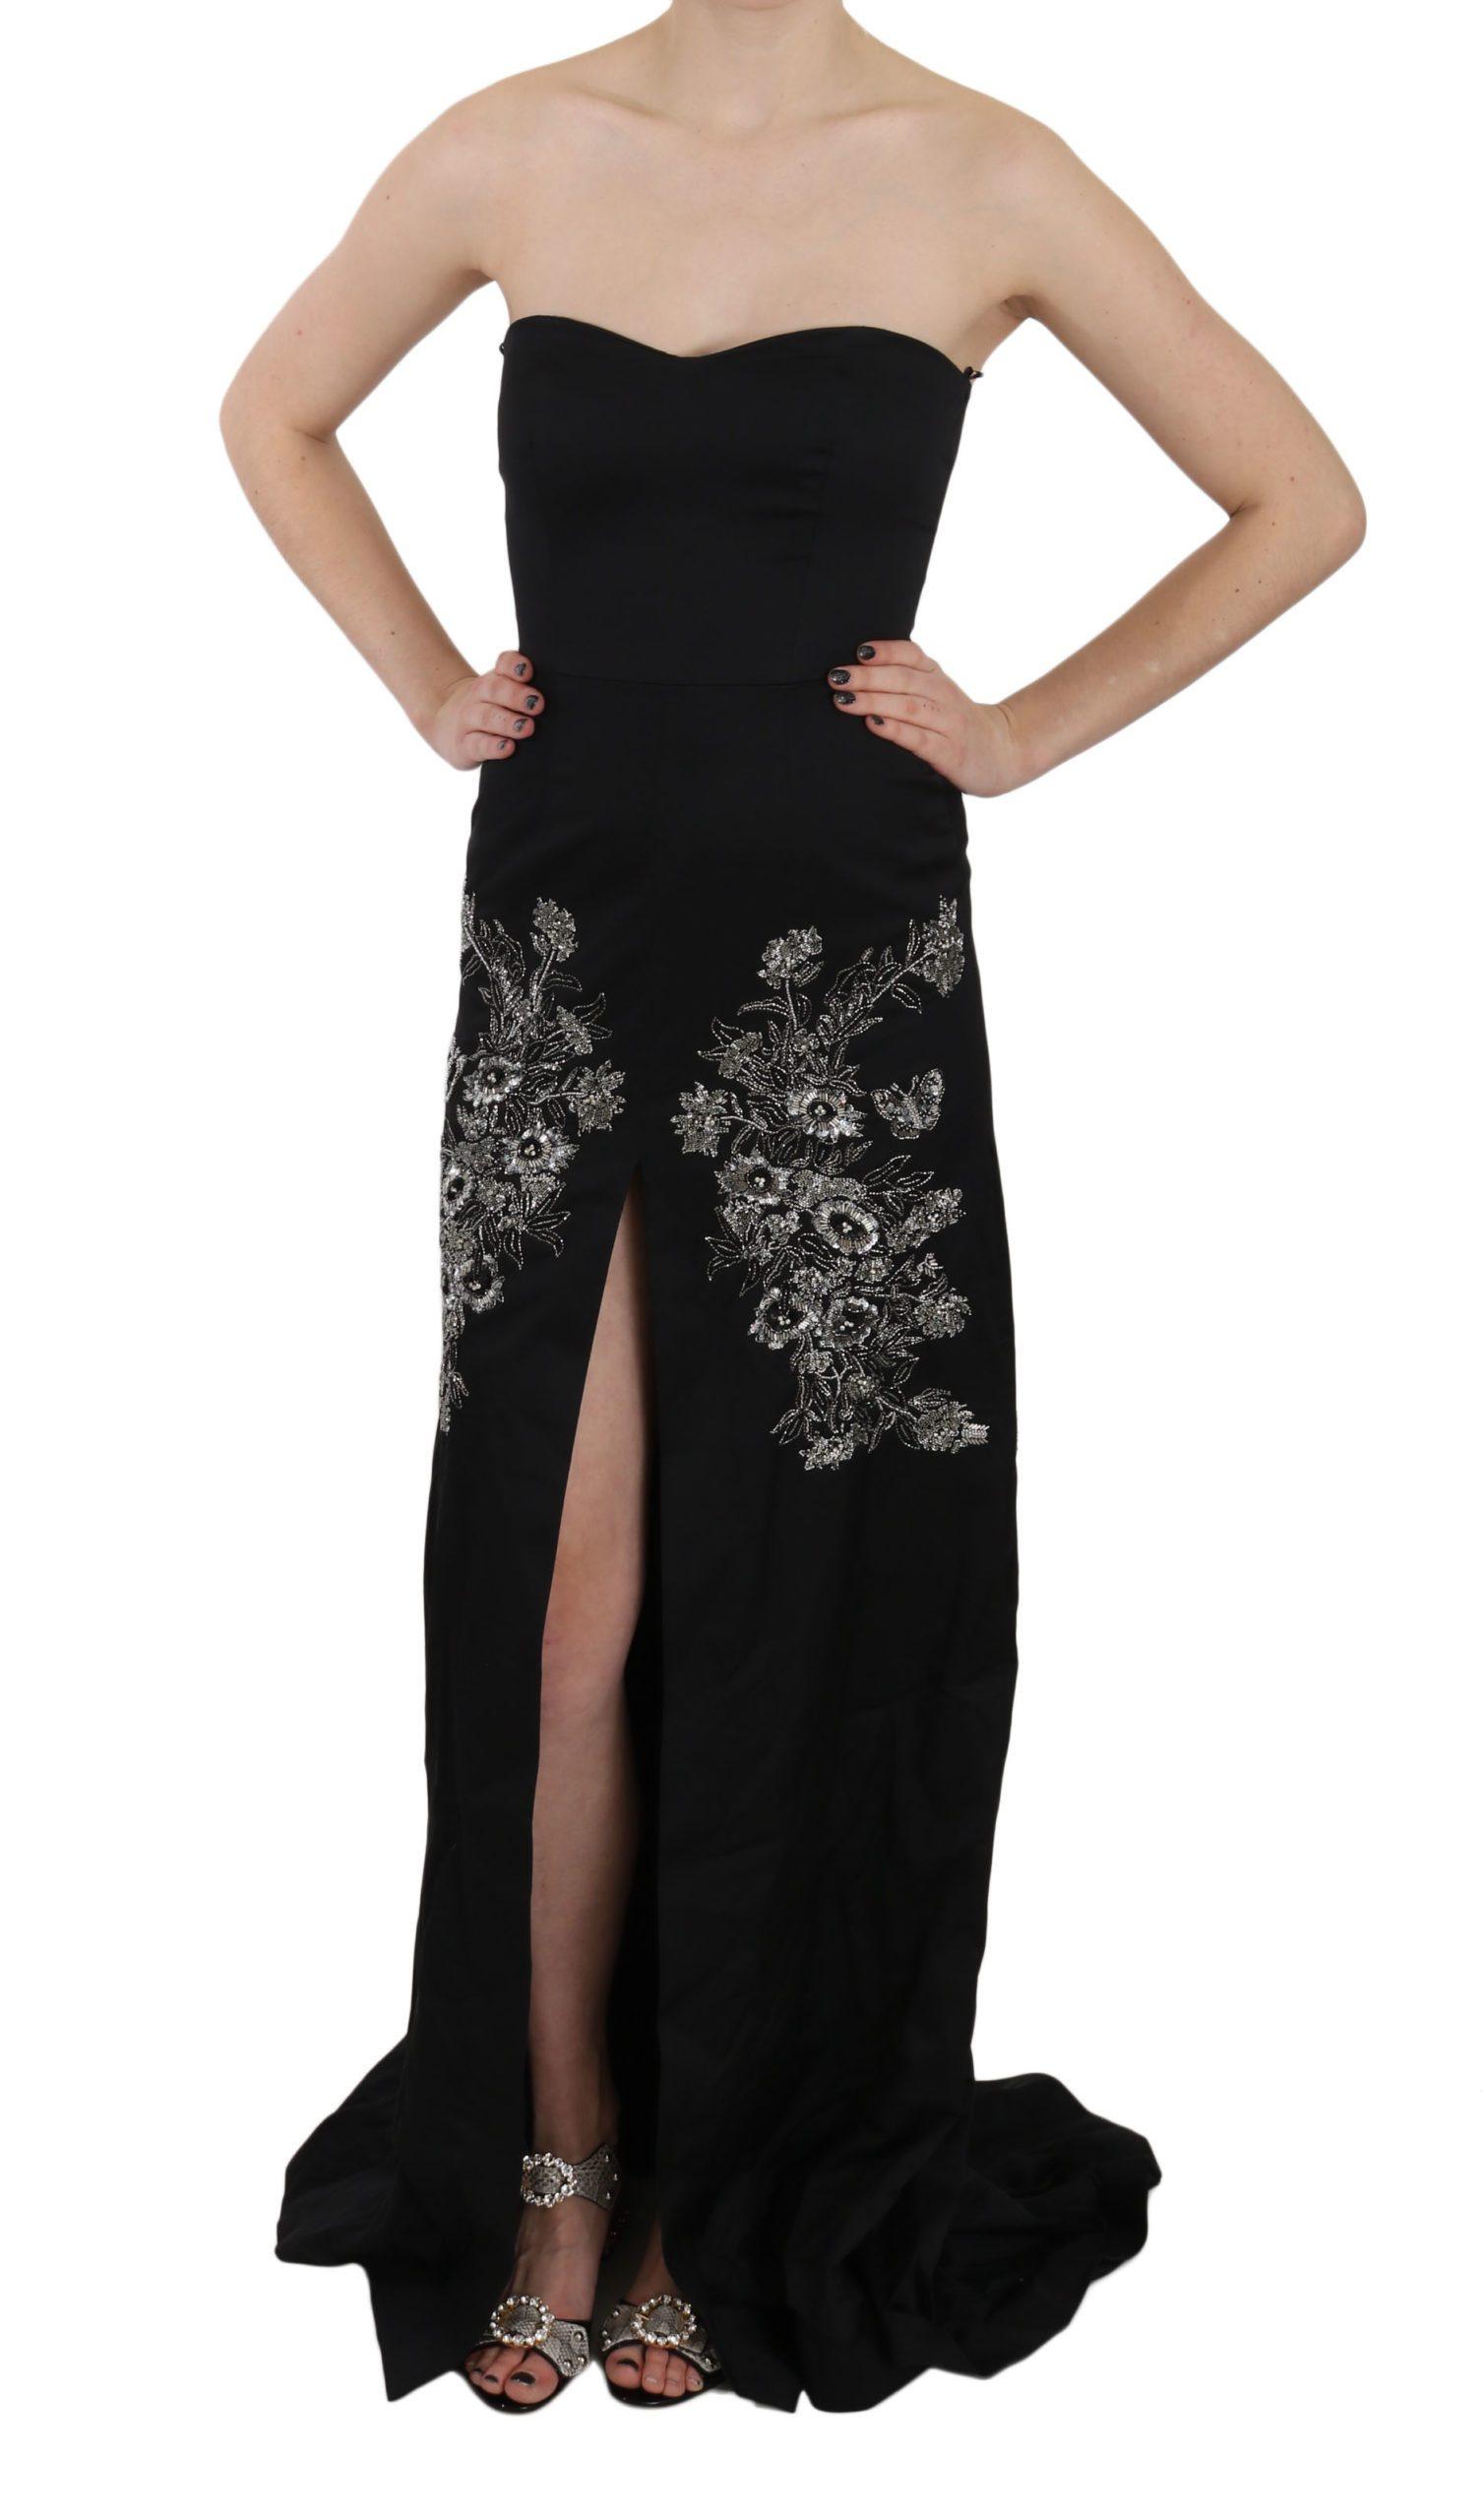 John Richmond Women's Sequined Flare Ball Dress Black DR1679 - IT42|M